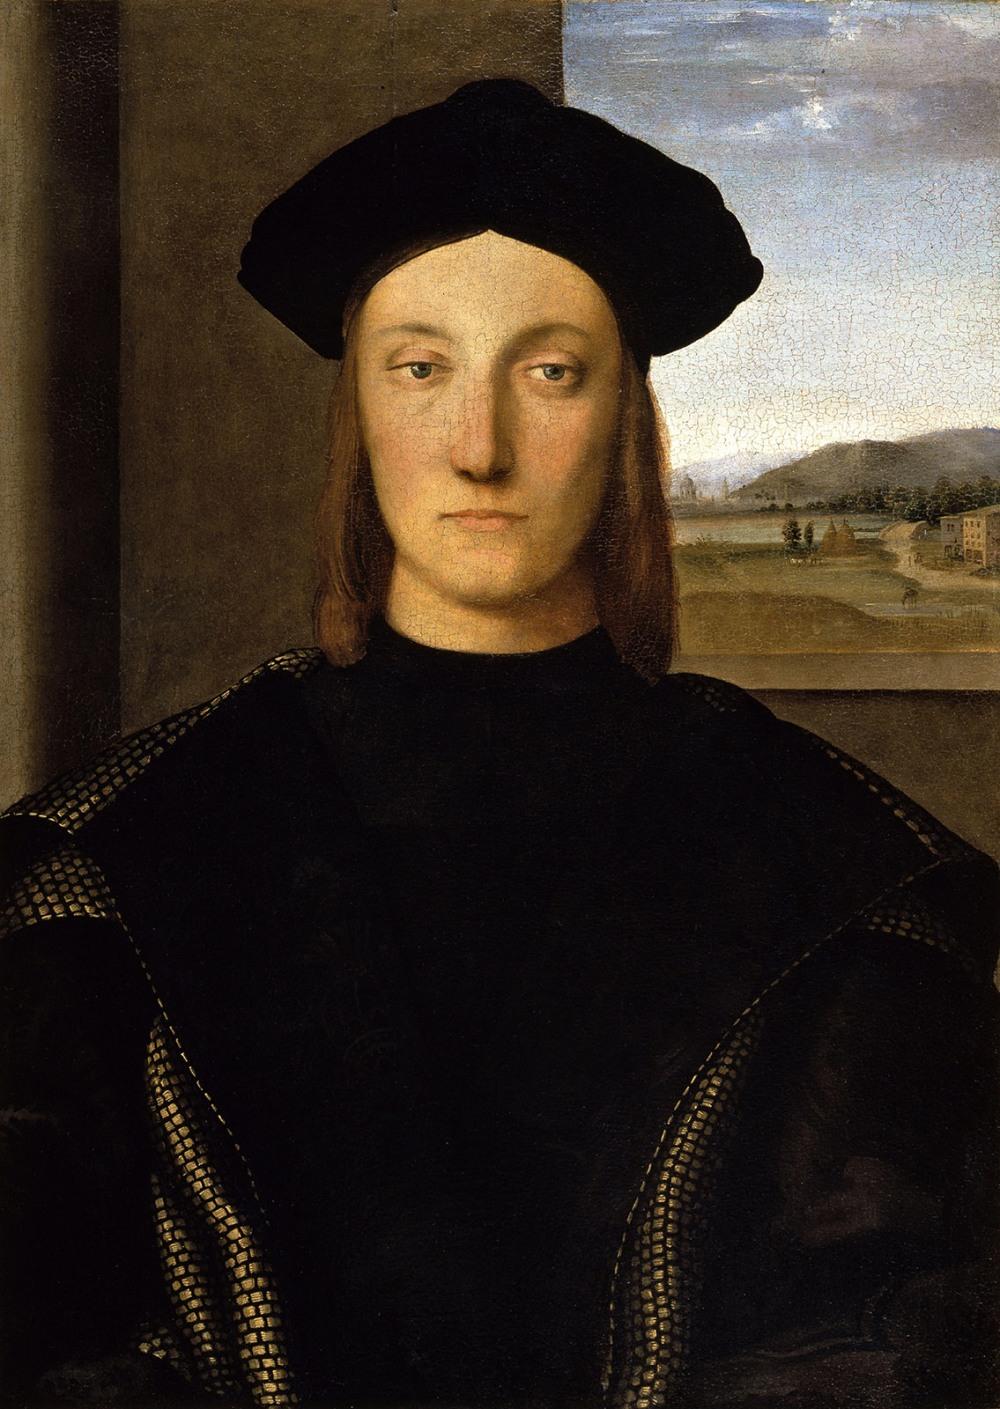 Rafael Sanzio. Guidobaldo de Montefeltro. Galeria de los Ufizzi. Florencia.